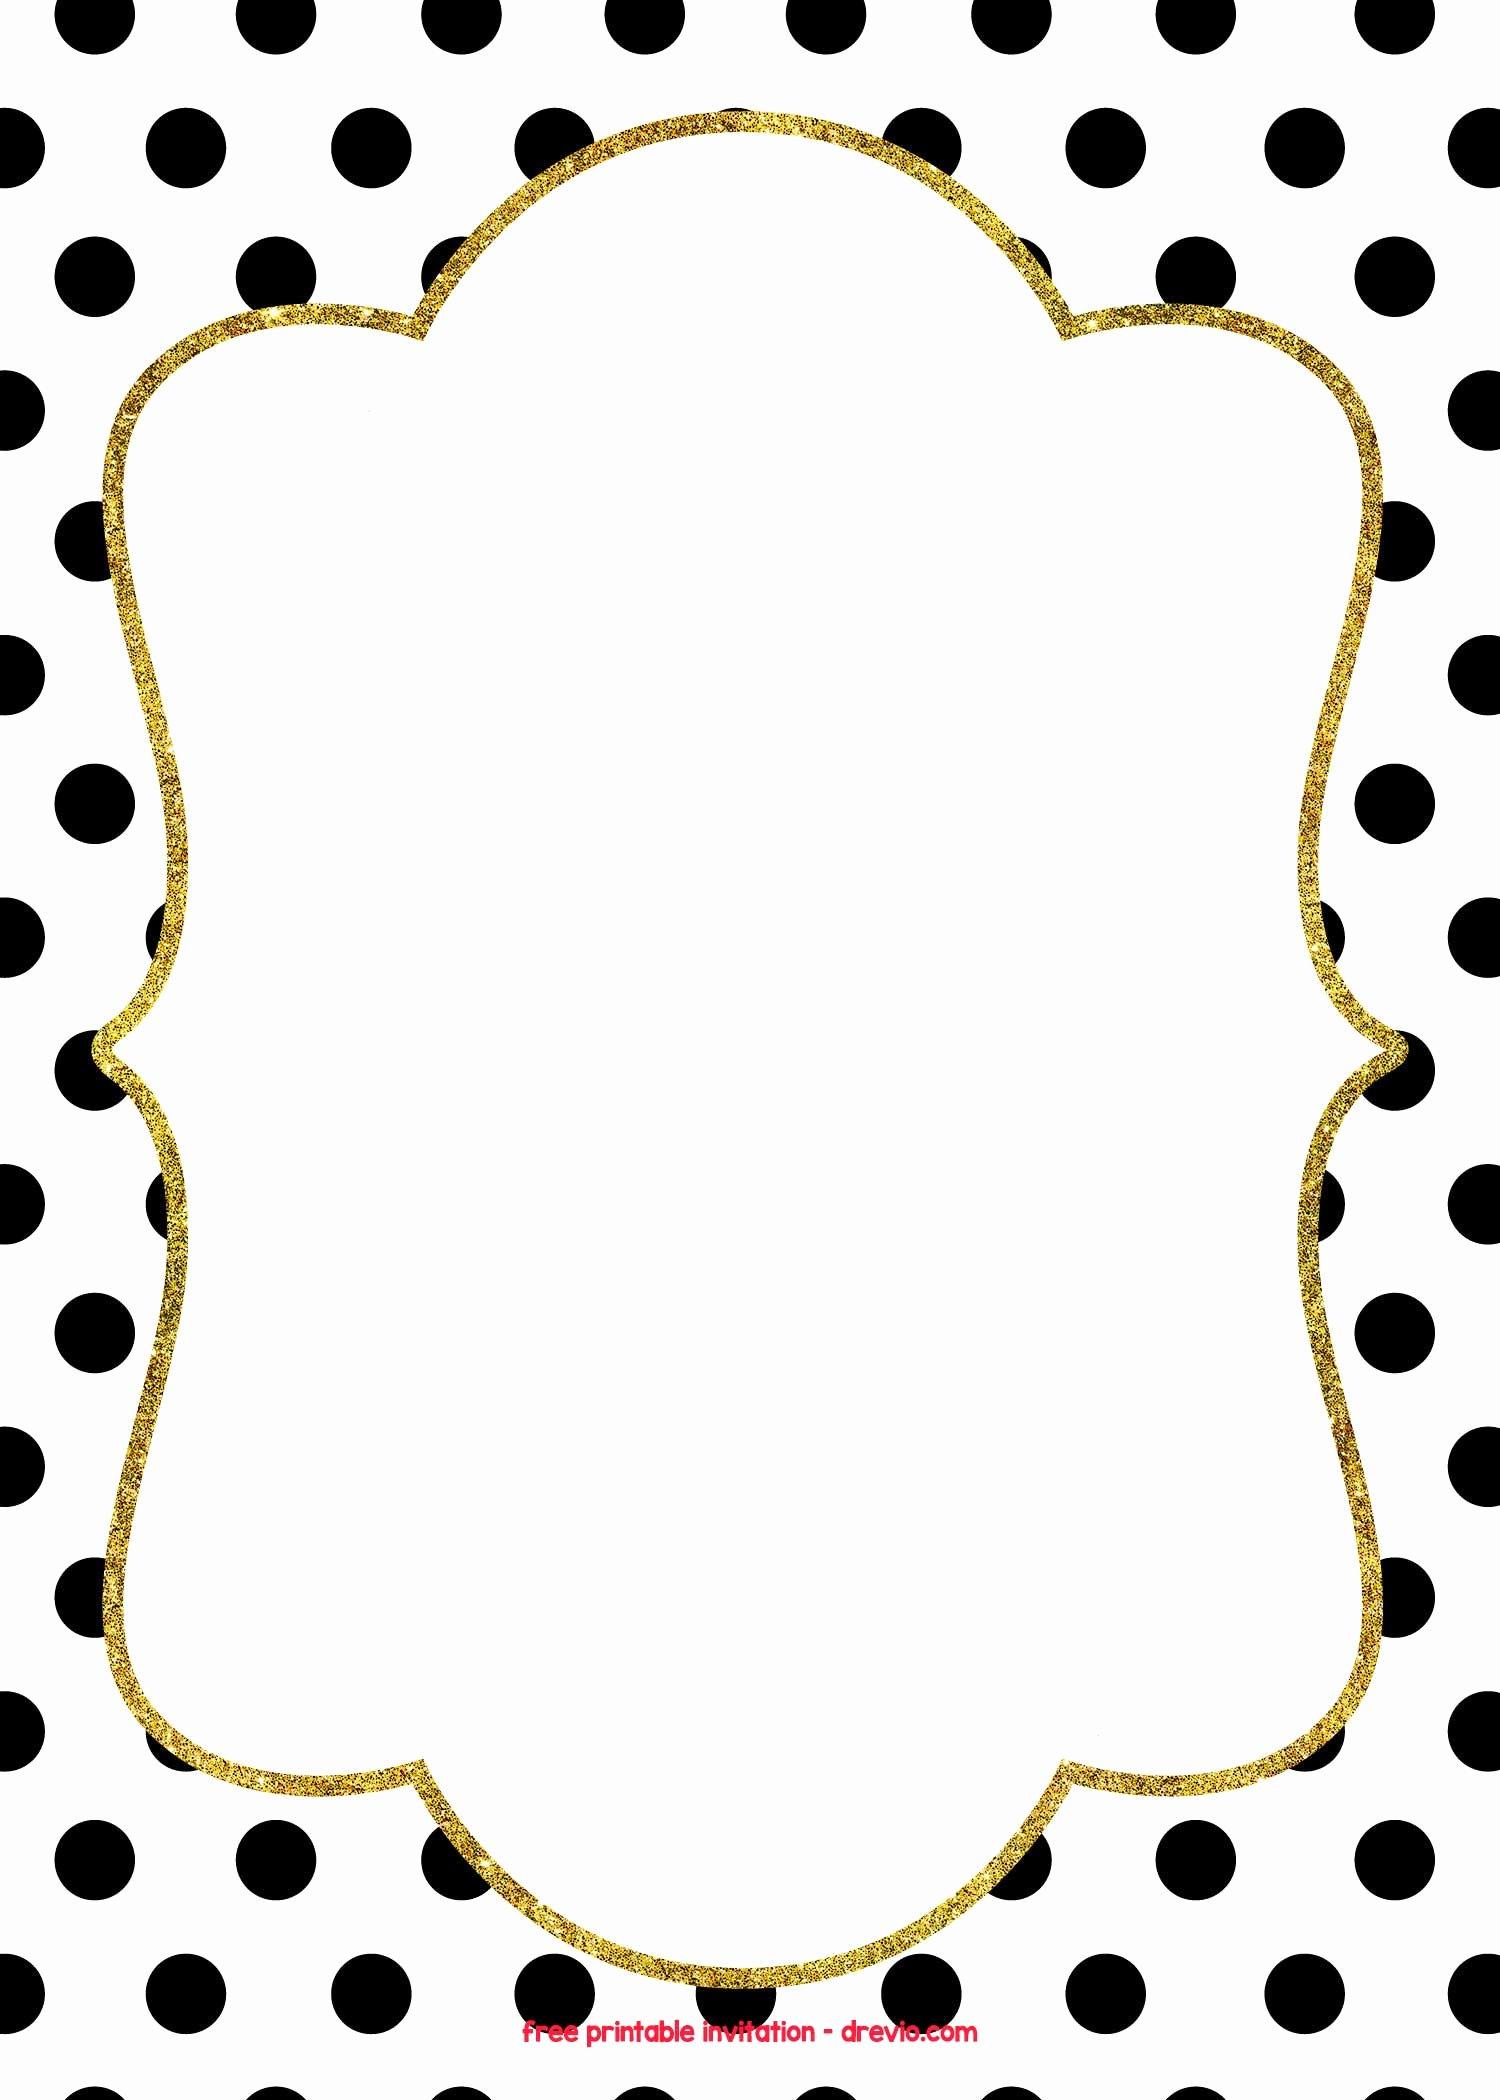 Polka Dot Invitation Template Best Of Free Golden Polkadot Invitation Templates